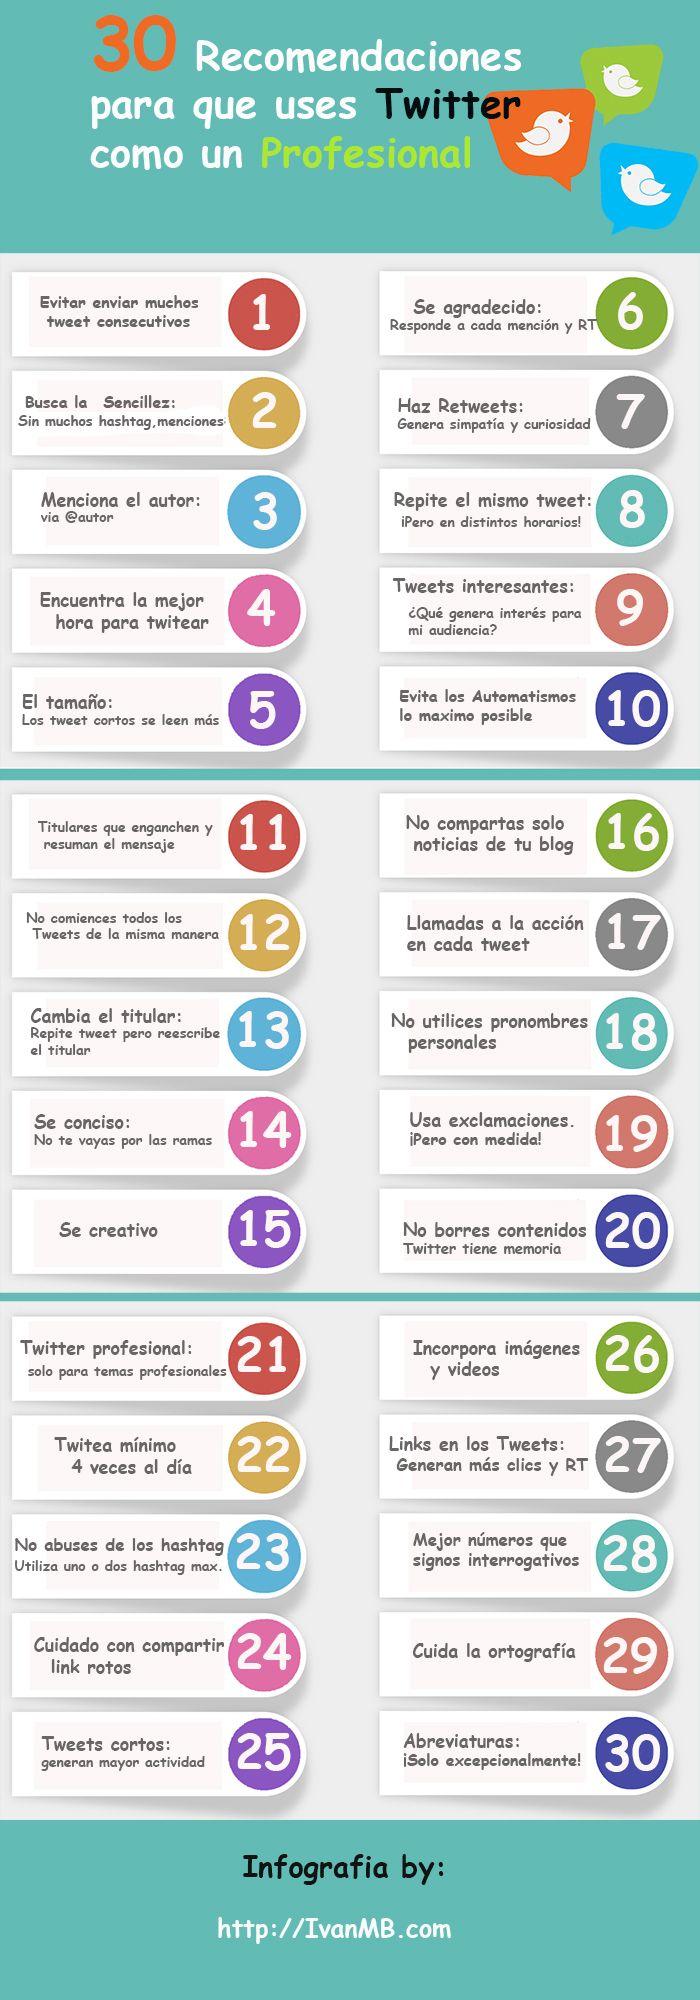 30 recomendaciones para usar Twitter como un profesional #infografia